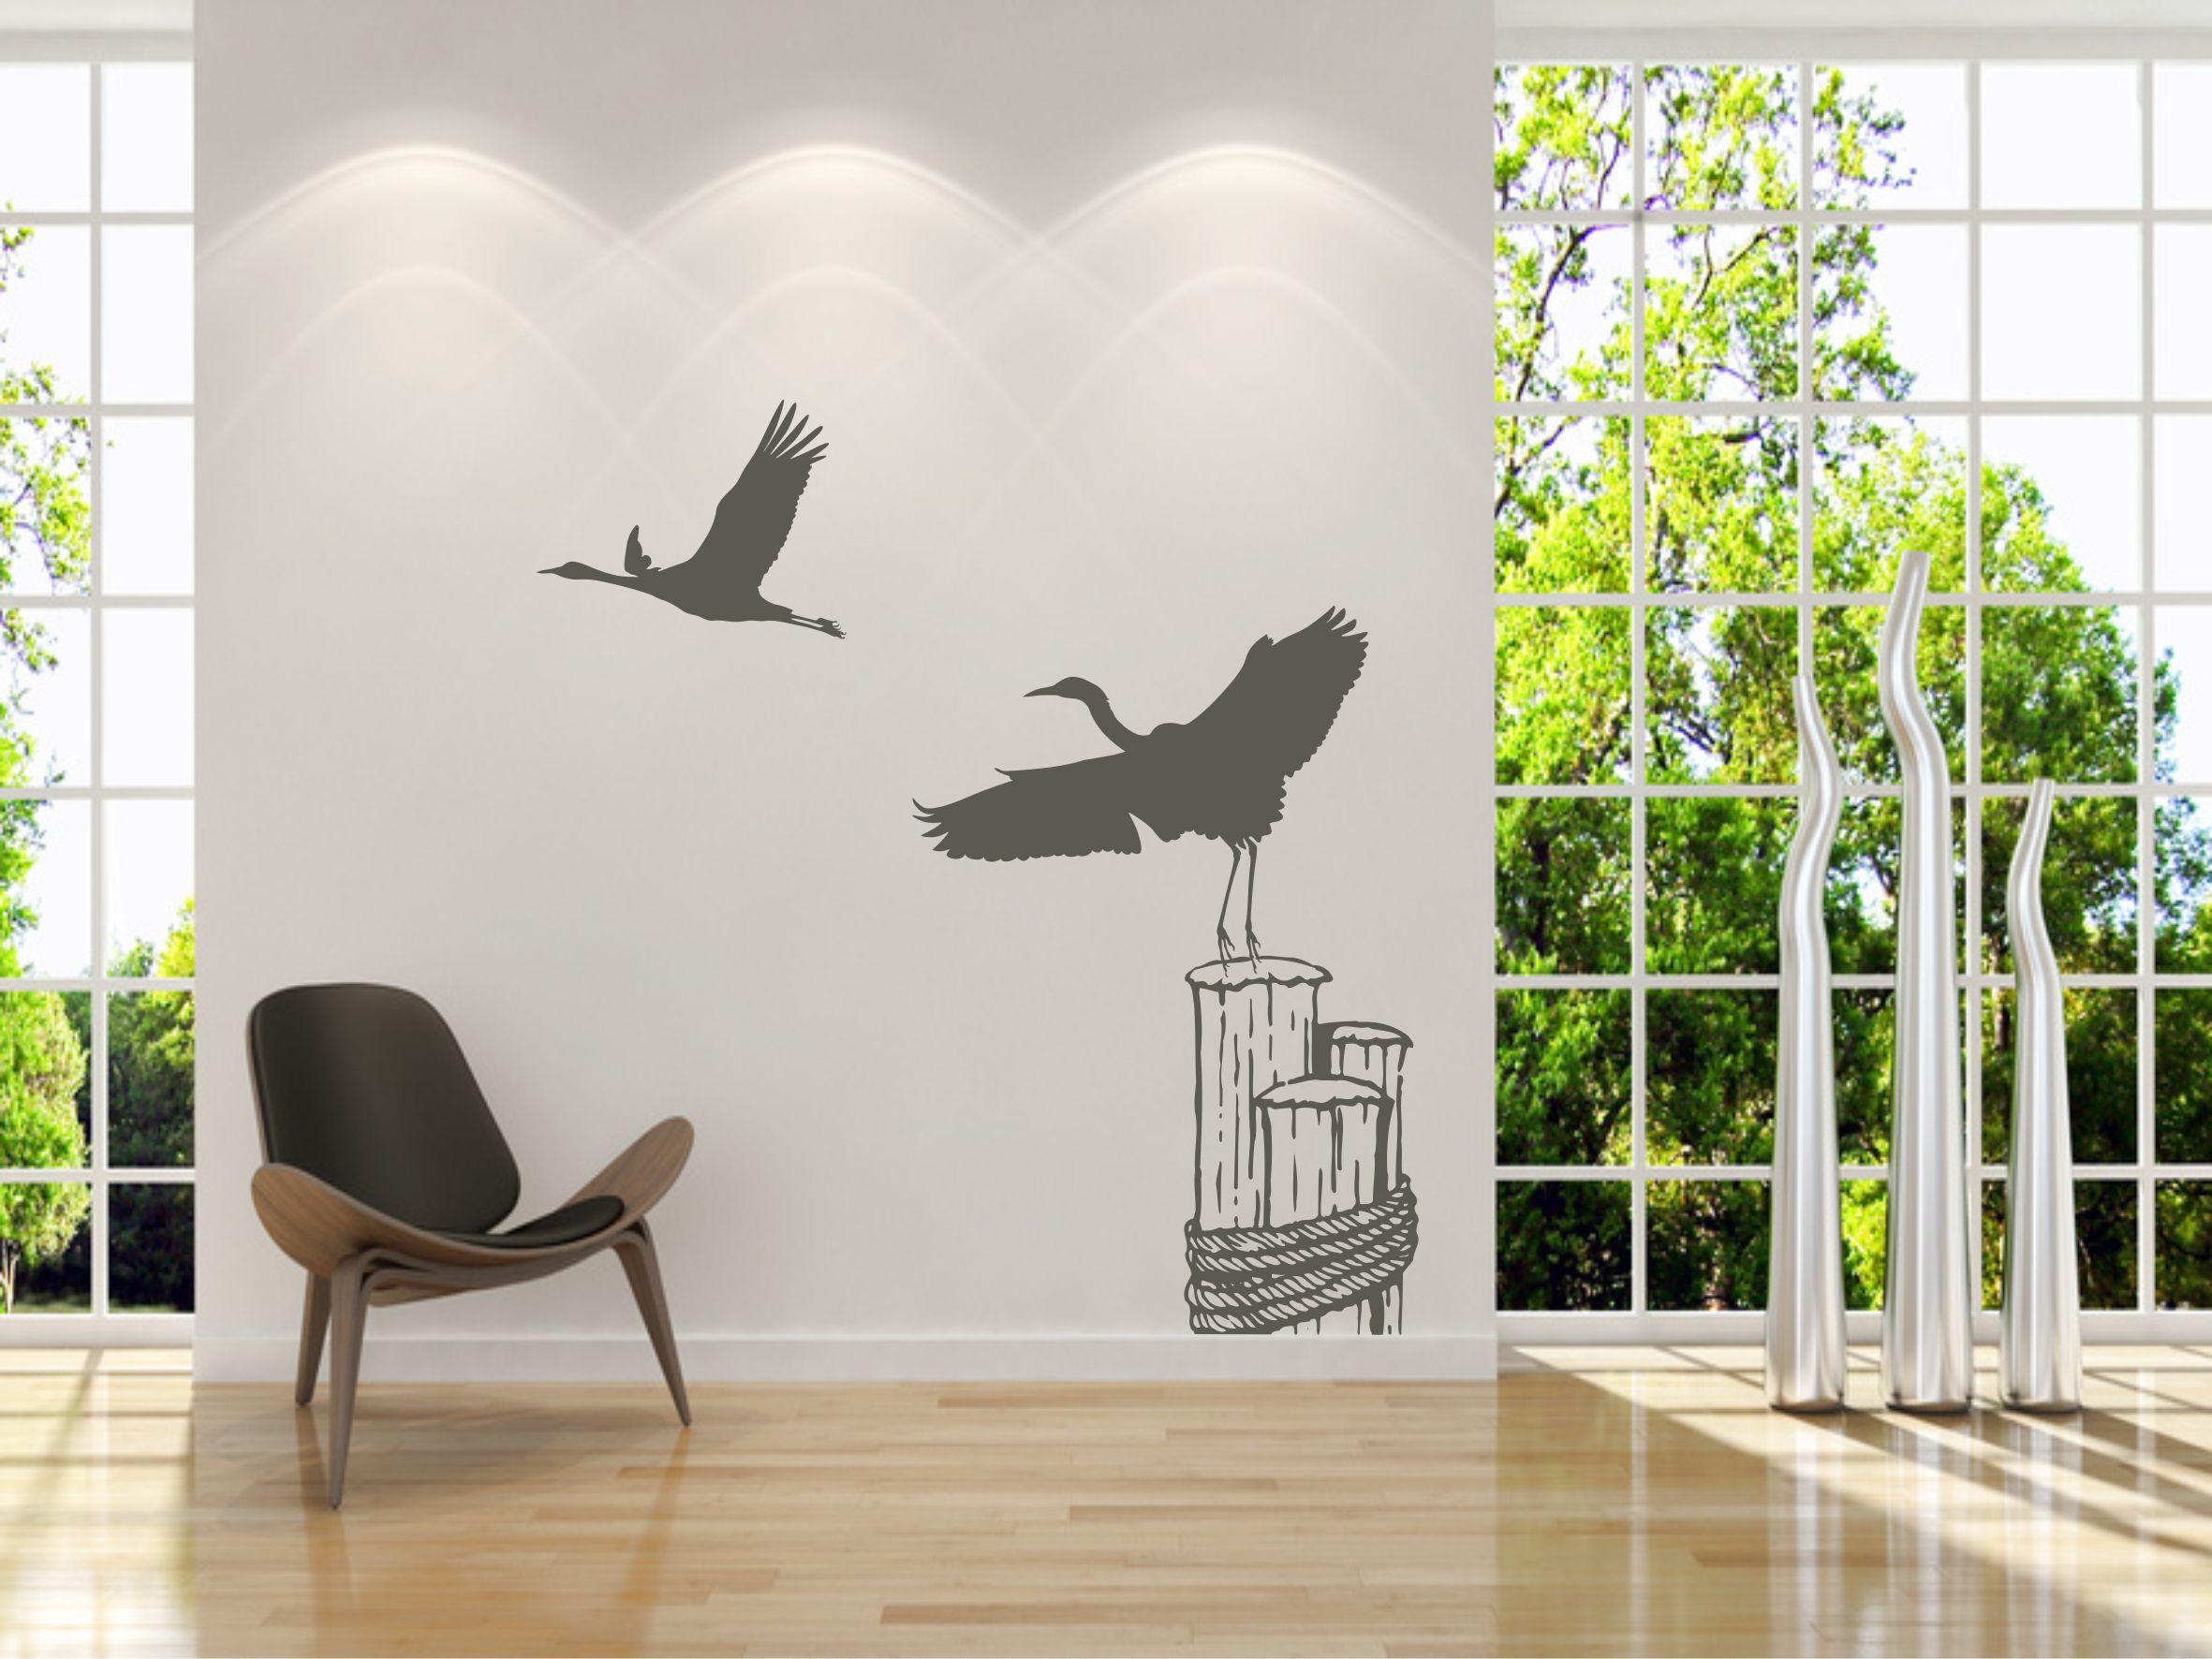 wandtattoo kraniche am himmel aufkleber. Black Bedroom Furniture Sets. Home Design Ideas